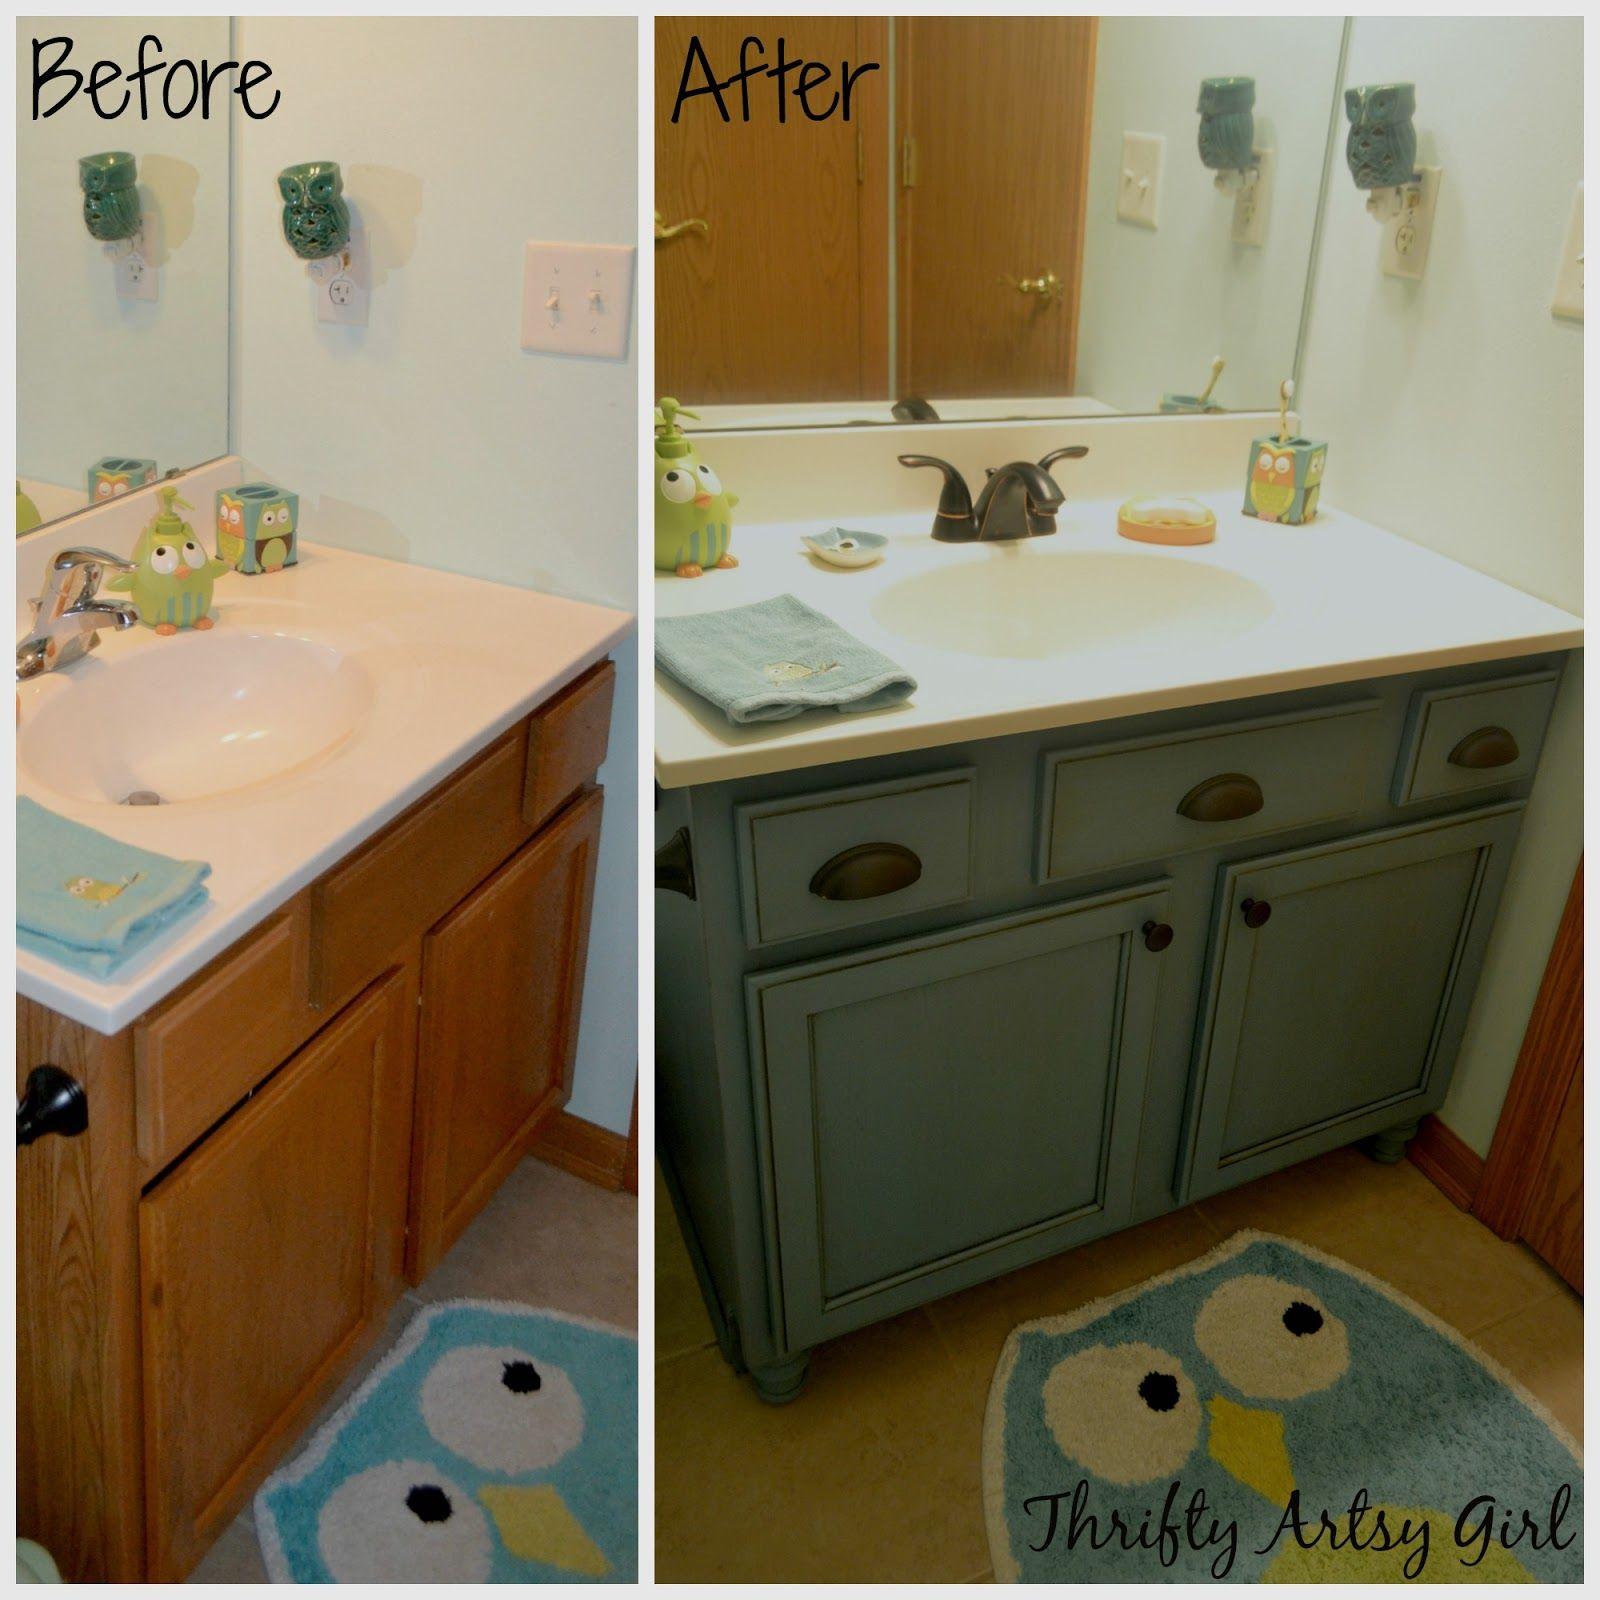 builders grade teal bathroom vanity upgrade for only bathroom ideas, chalk  paint, painted furniture, small bathroom ideas